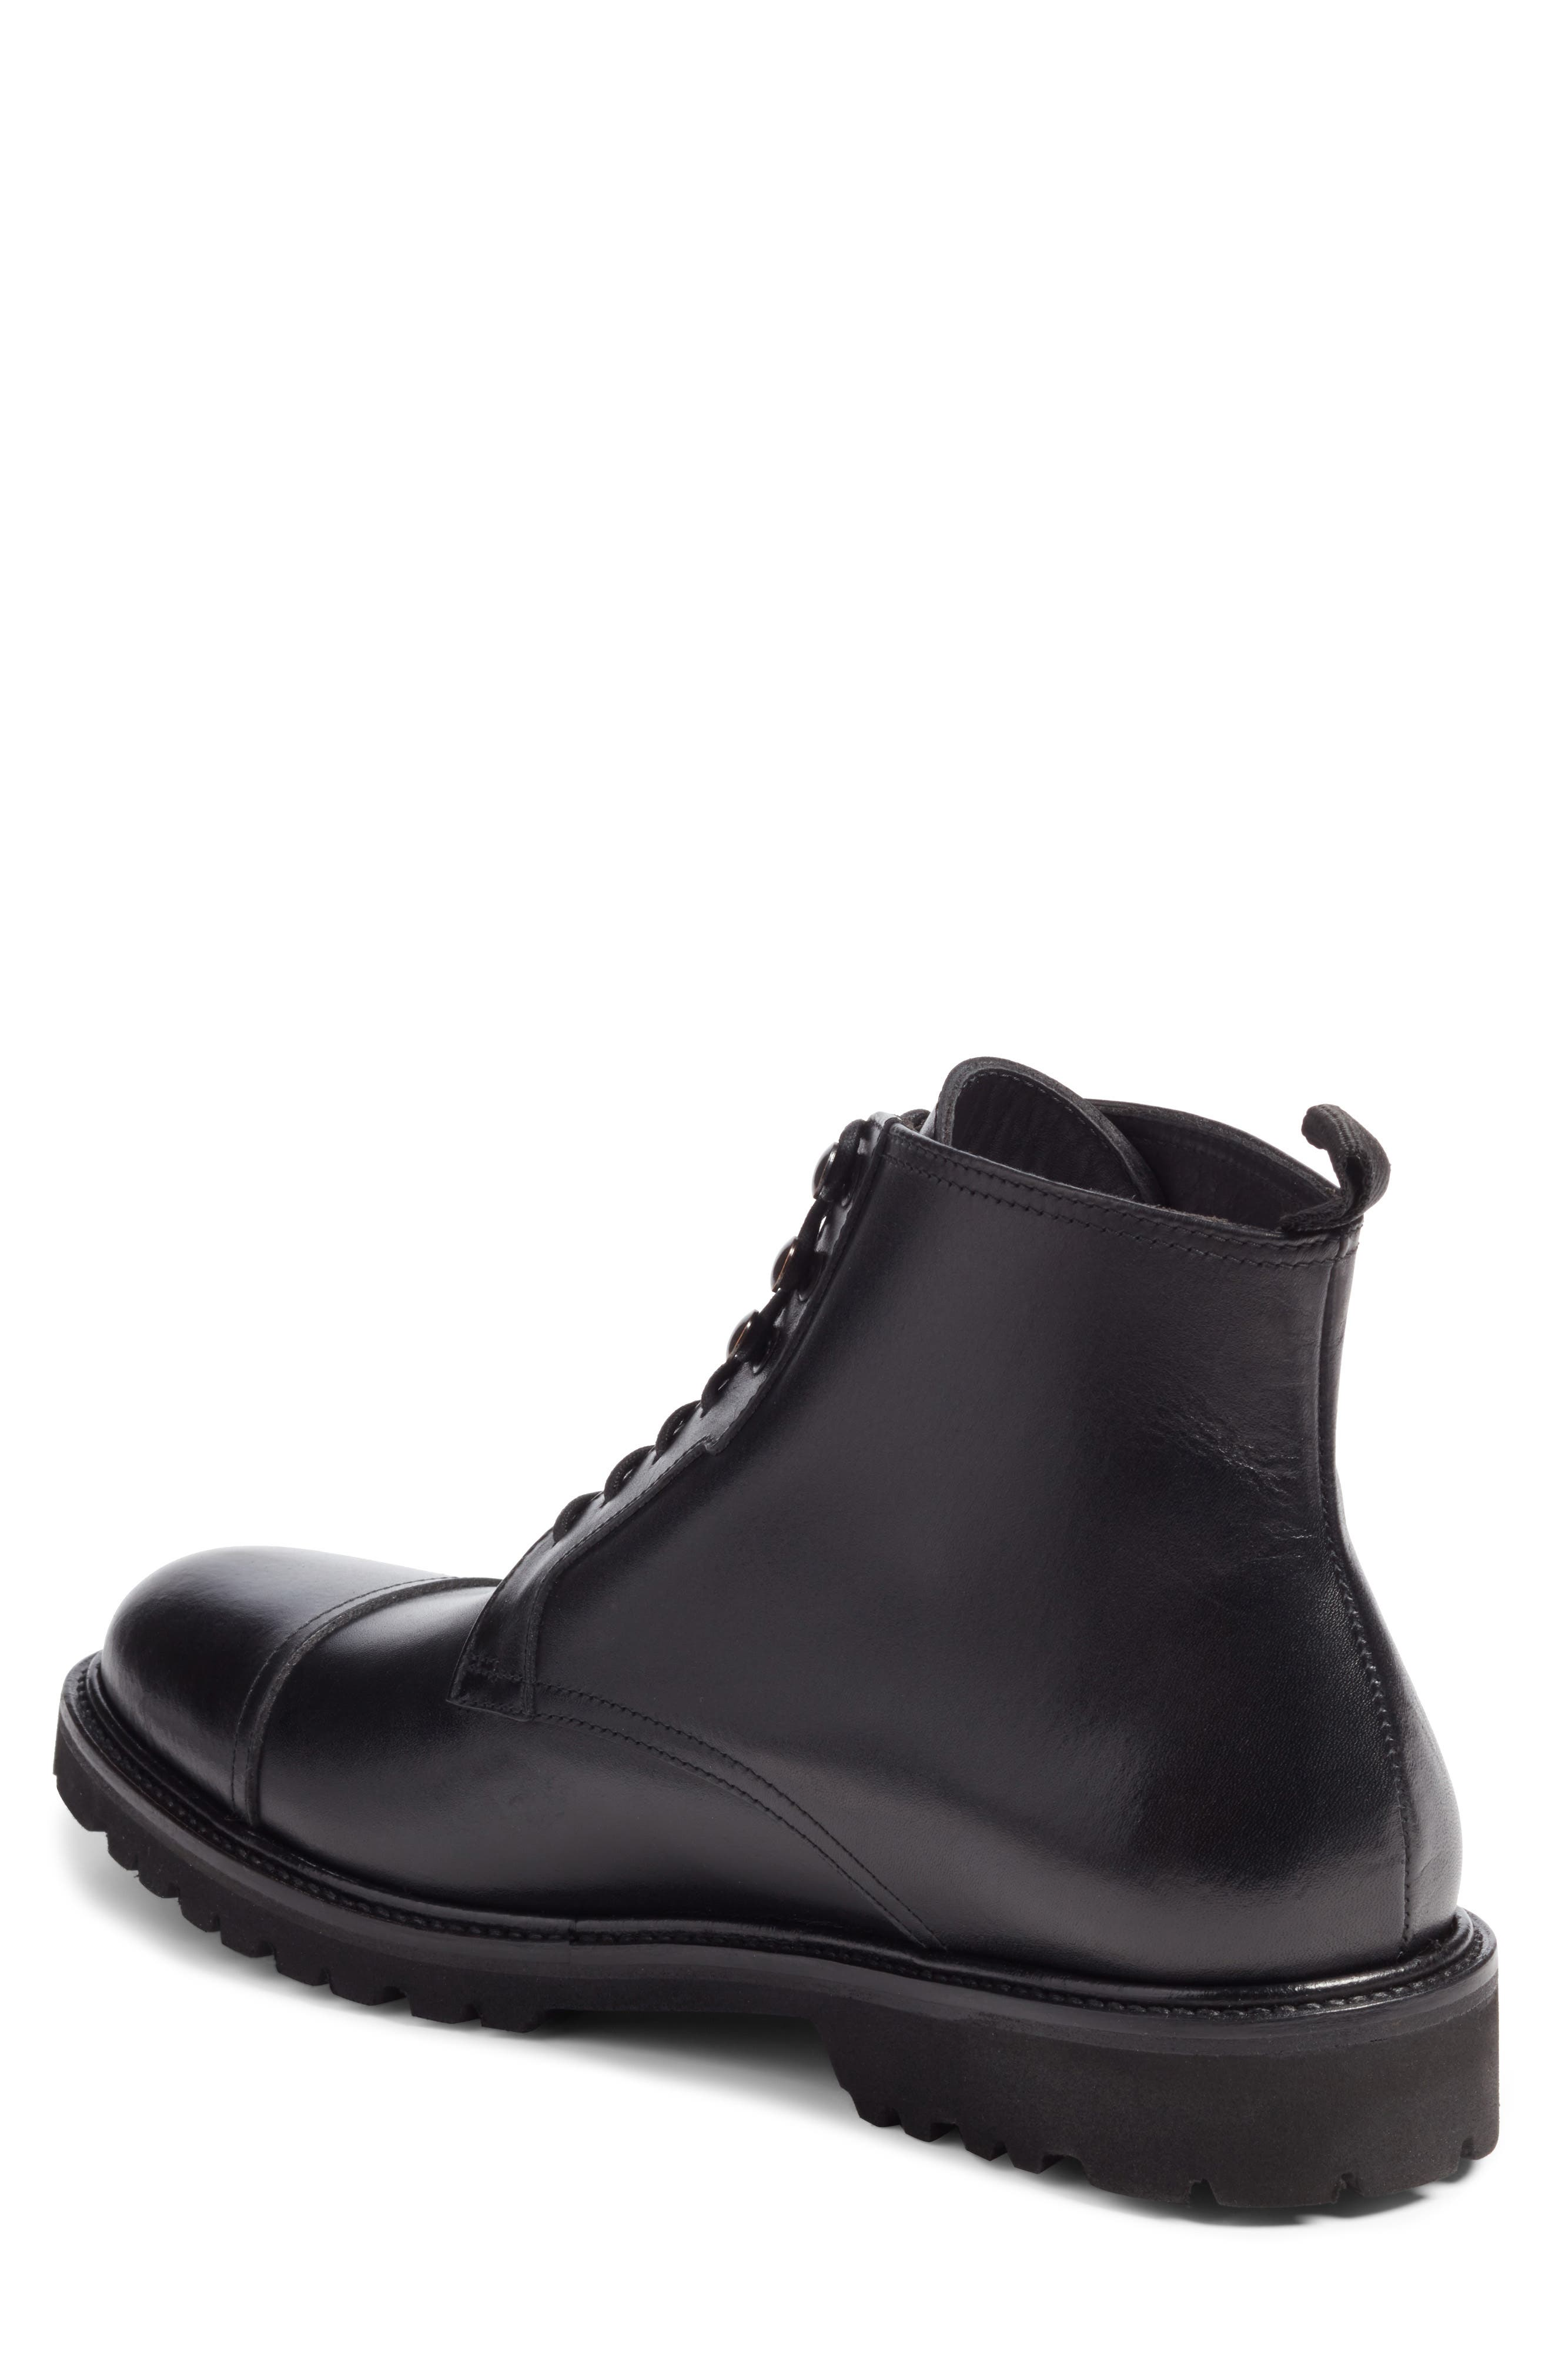 Alternate Image 2  - Monte Rosso Tropea Waterproof Cap Toe Boot (Men)